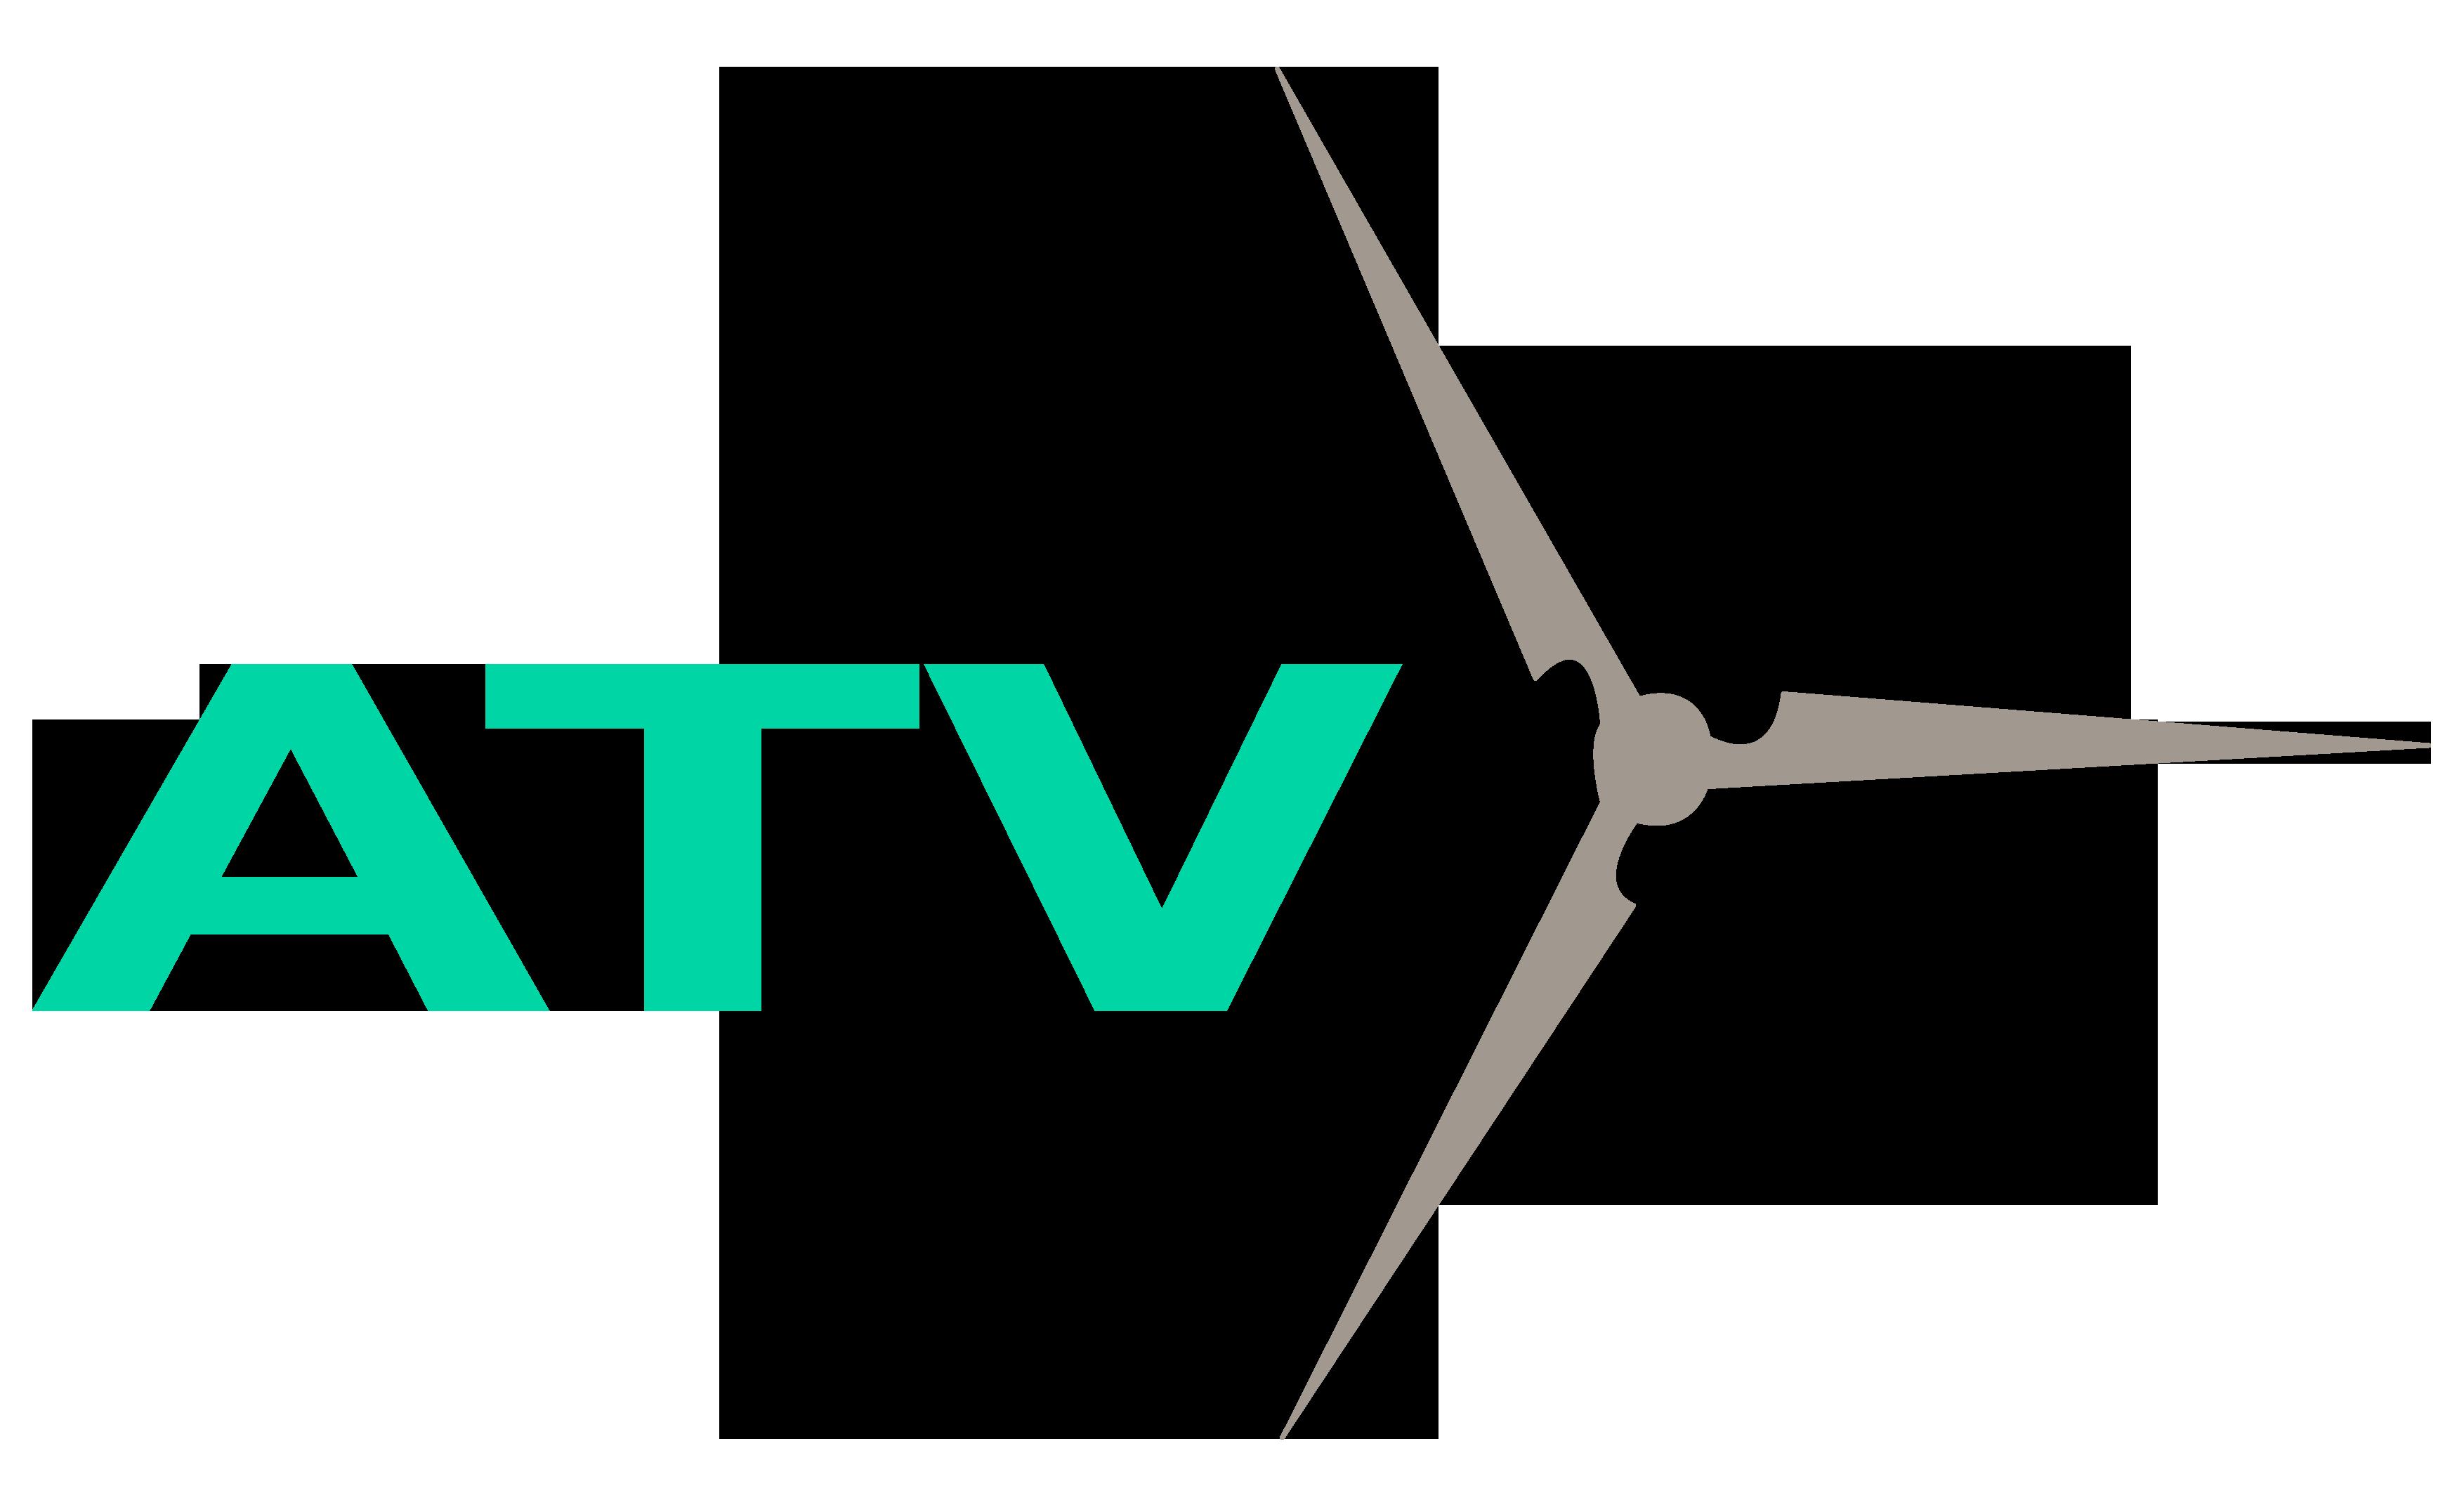 ATV - COMPOSITE